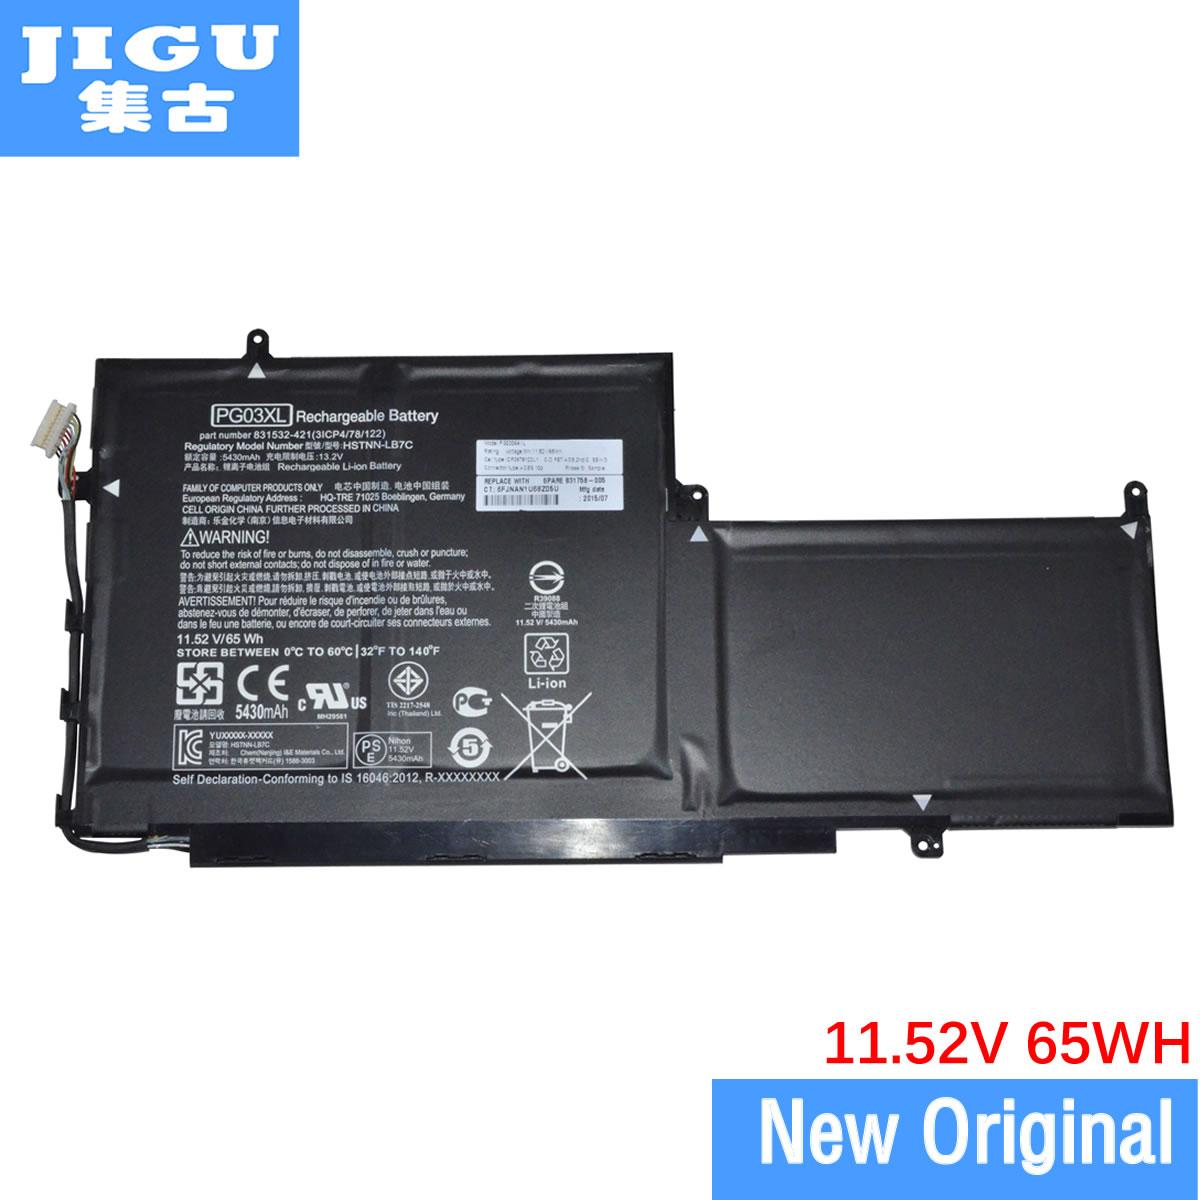 JIGU 65WH الأصلي اللوحي بطارية HSTNN-LB7C PG03XL TPN-Q168 لإتش بي شبح X360 15 Ap011dx 11.52V